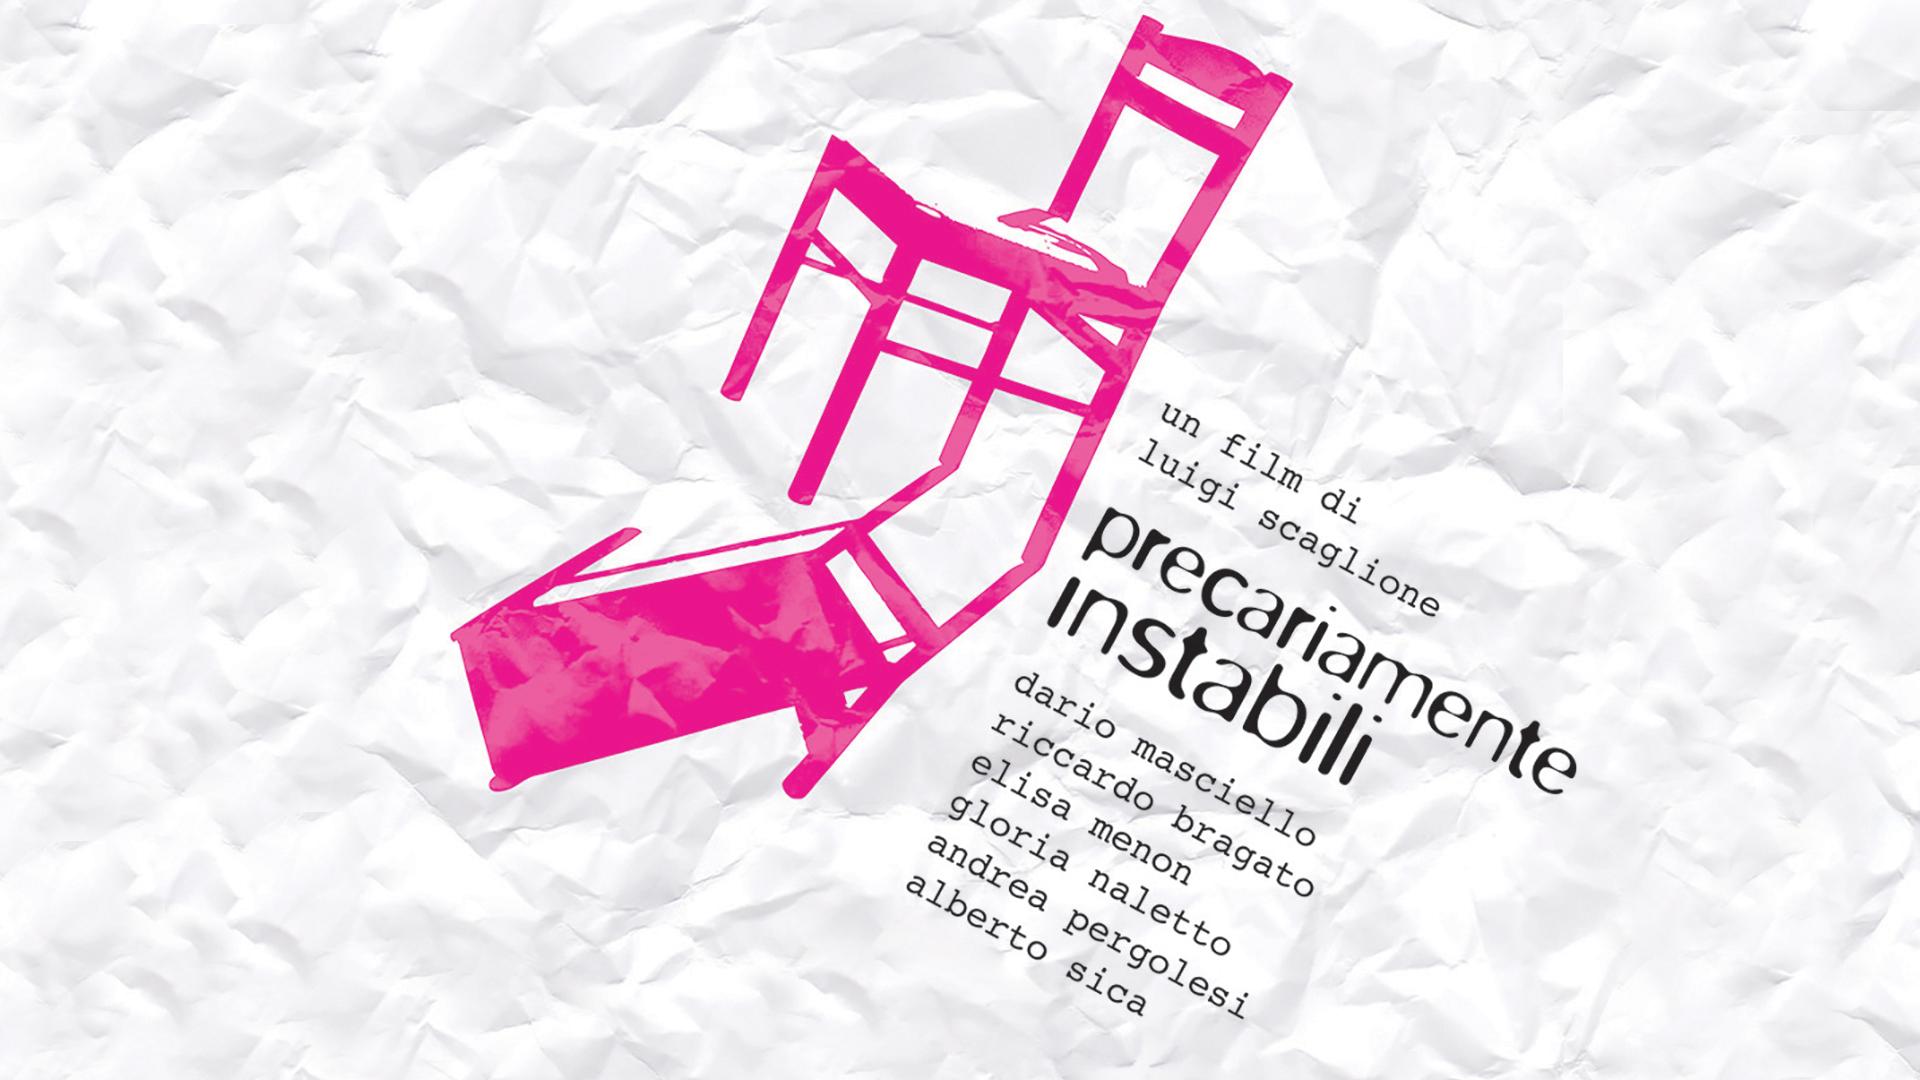 Precariously unstable - Precariamente instabili